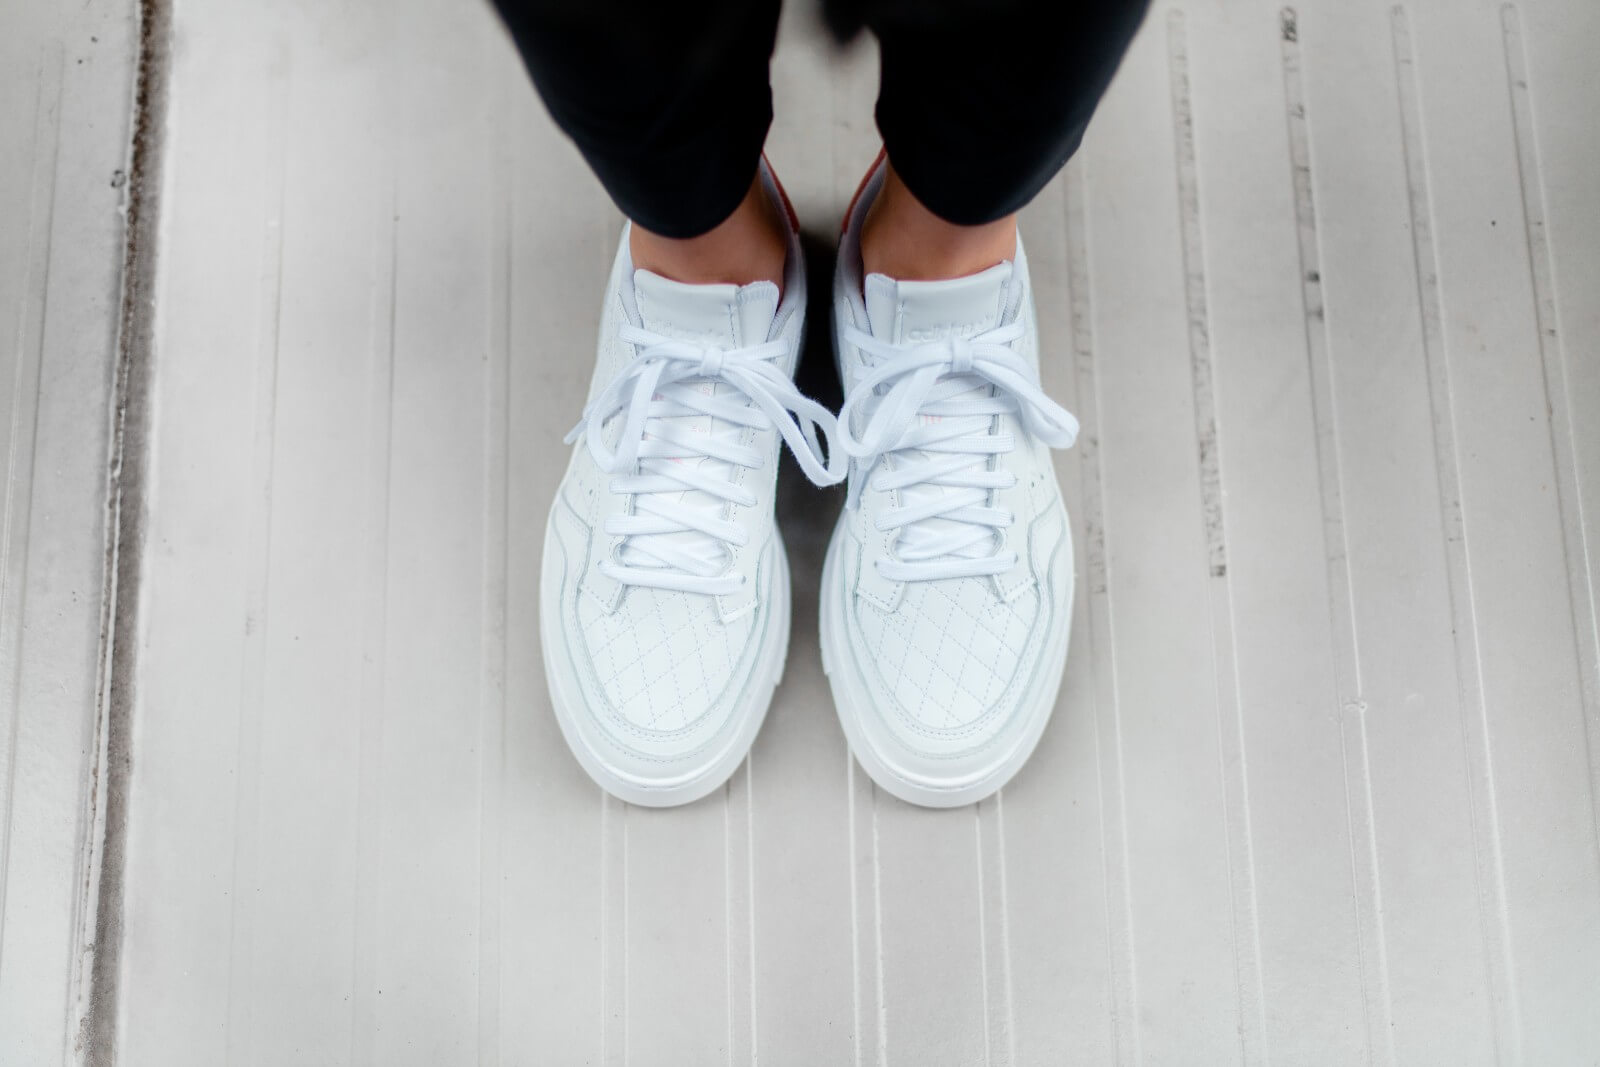 Característica Resistencia pakistaní  Adidas Women's Supercourt Footwear White/Glow Pink - EF5925